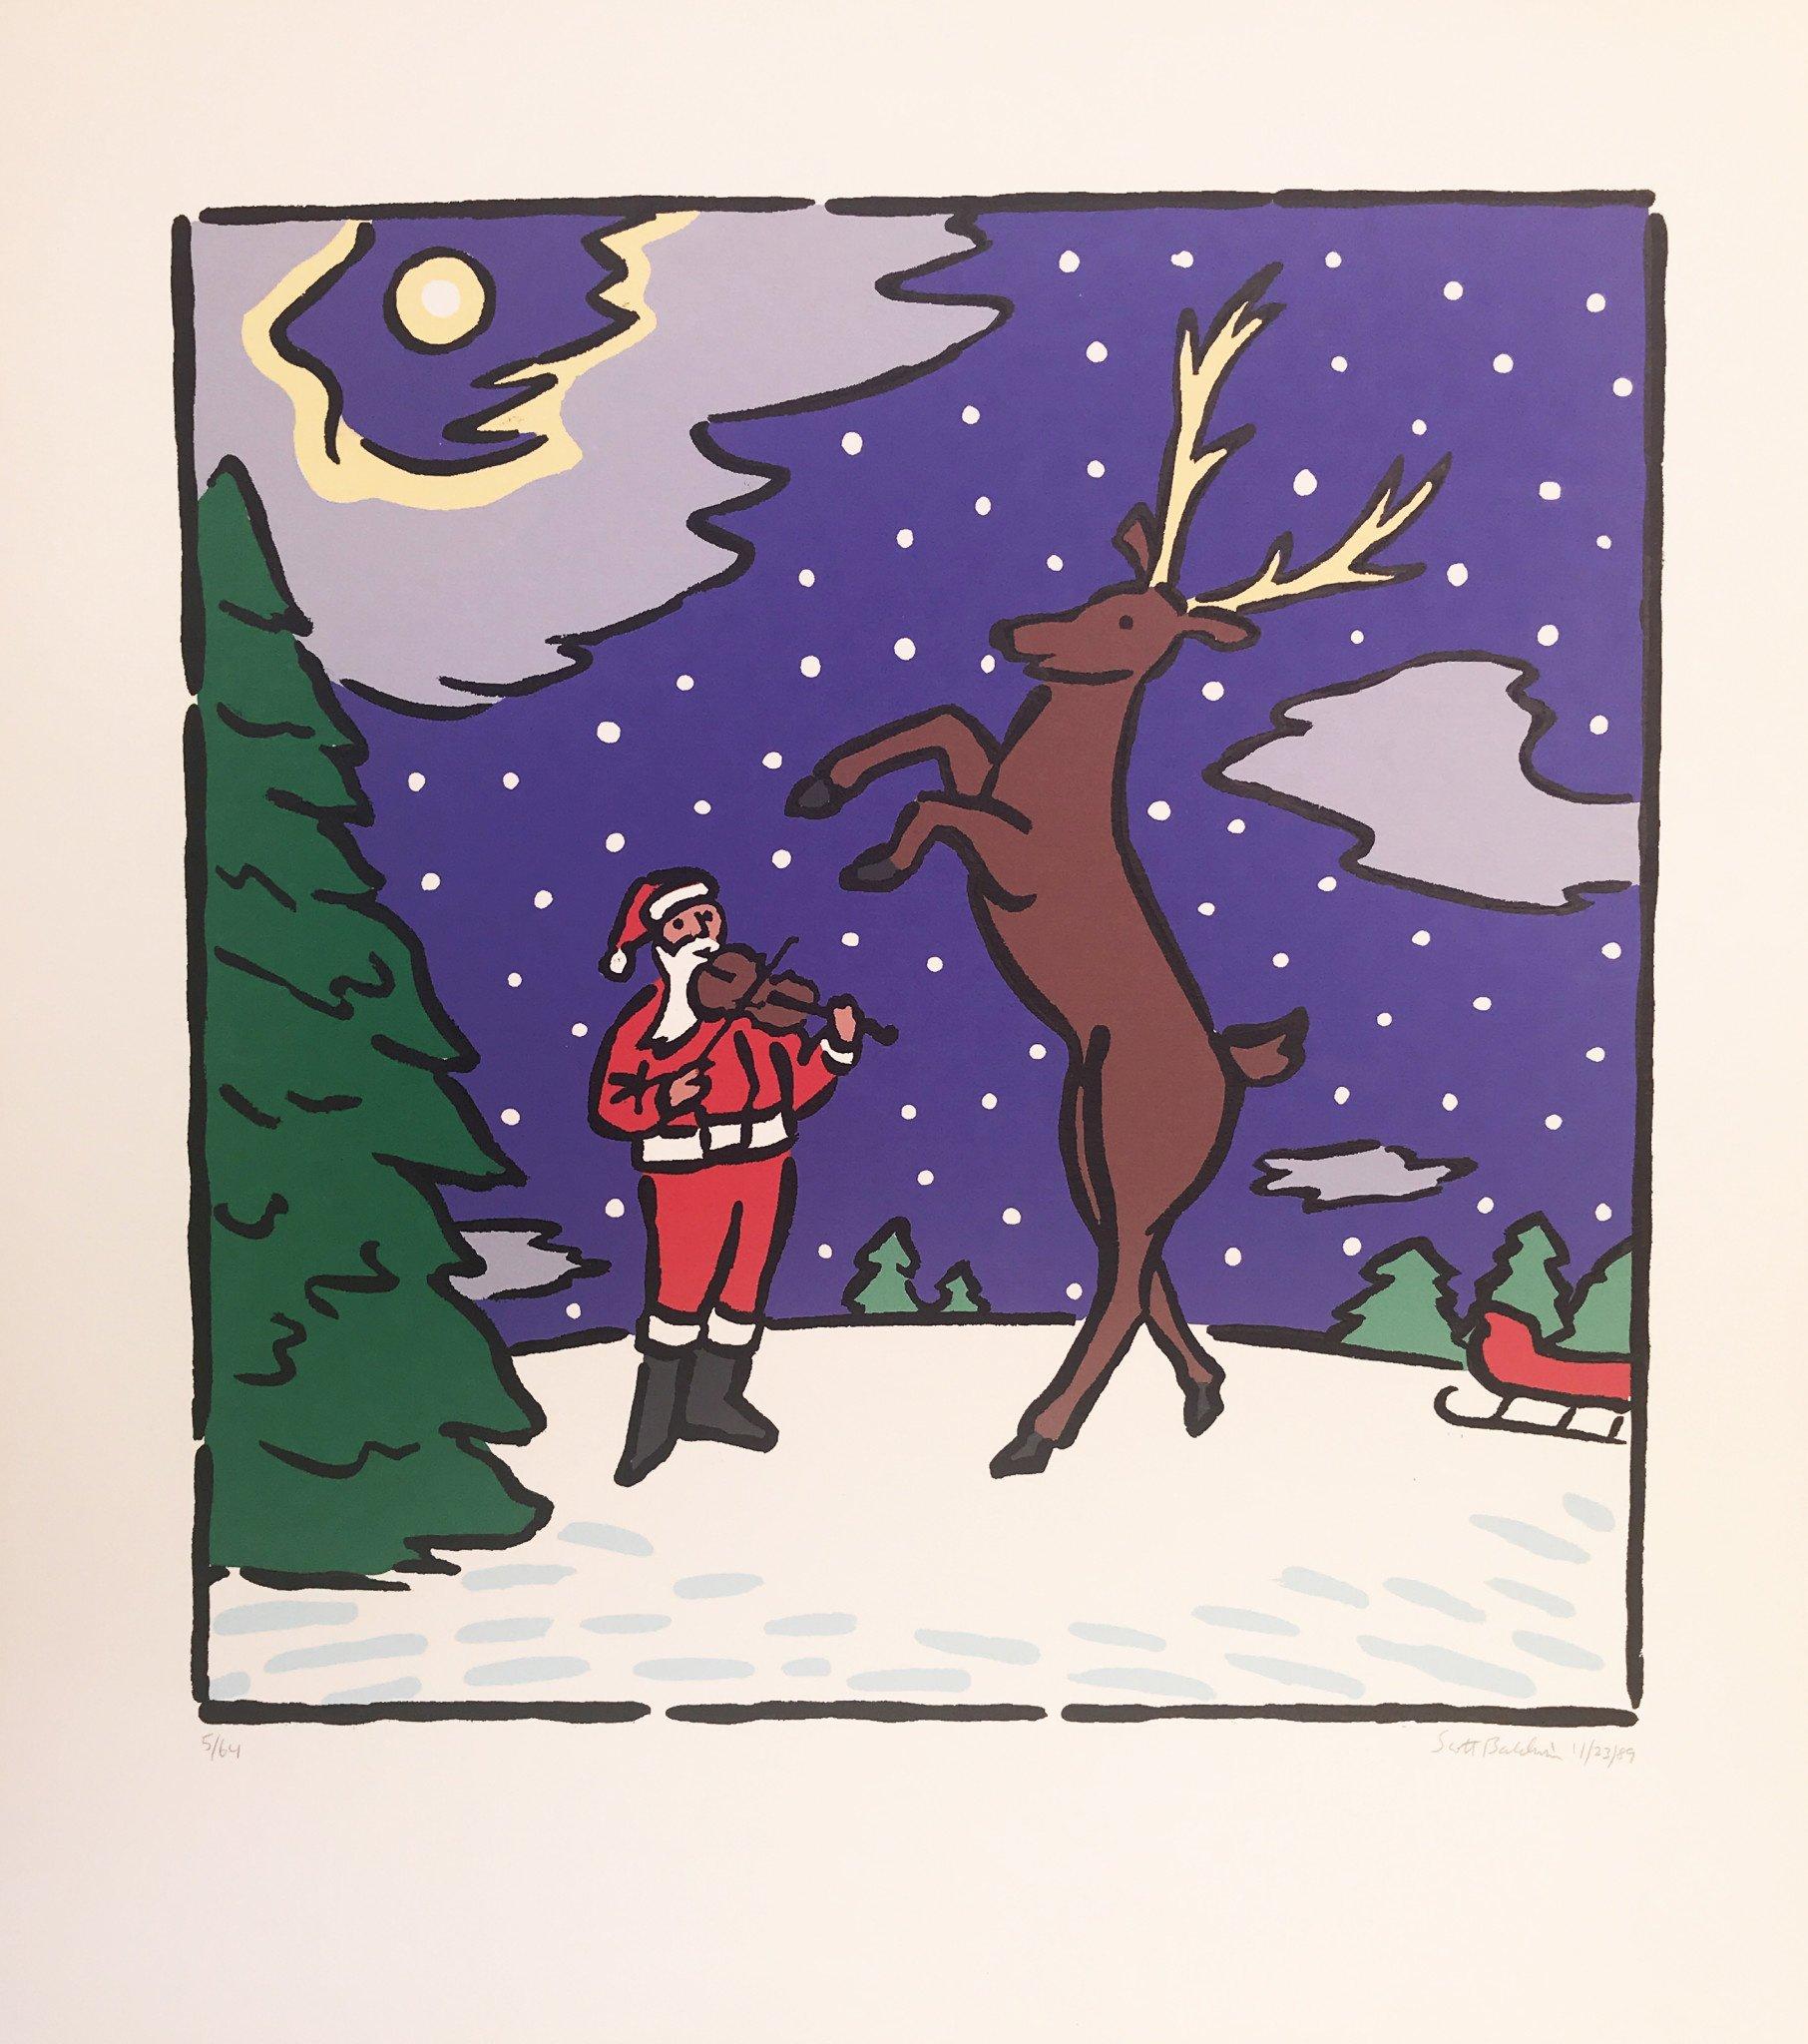 Limited Edition Santa & Reindeer Lithograph by Scott Baldwin